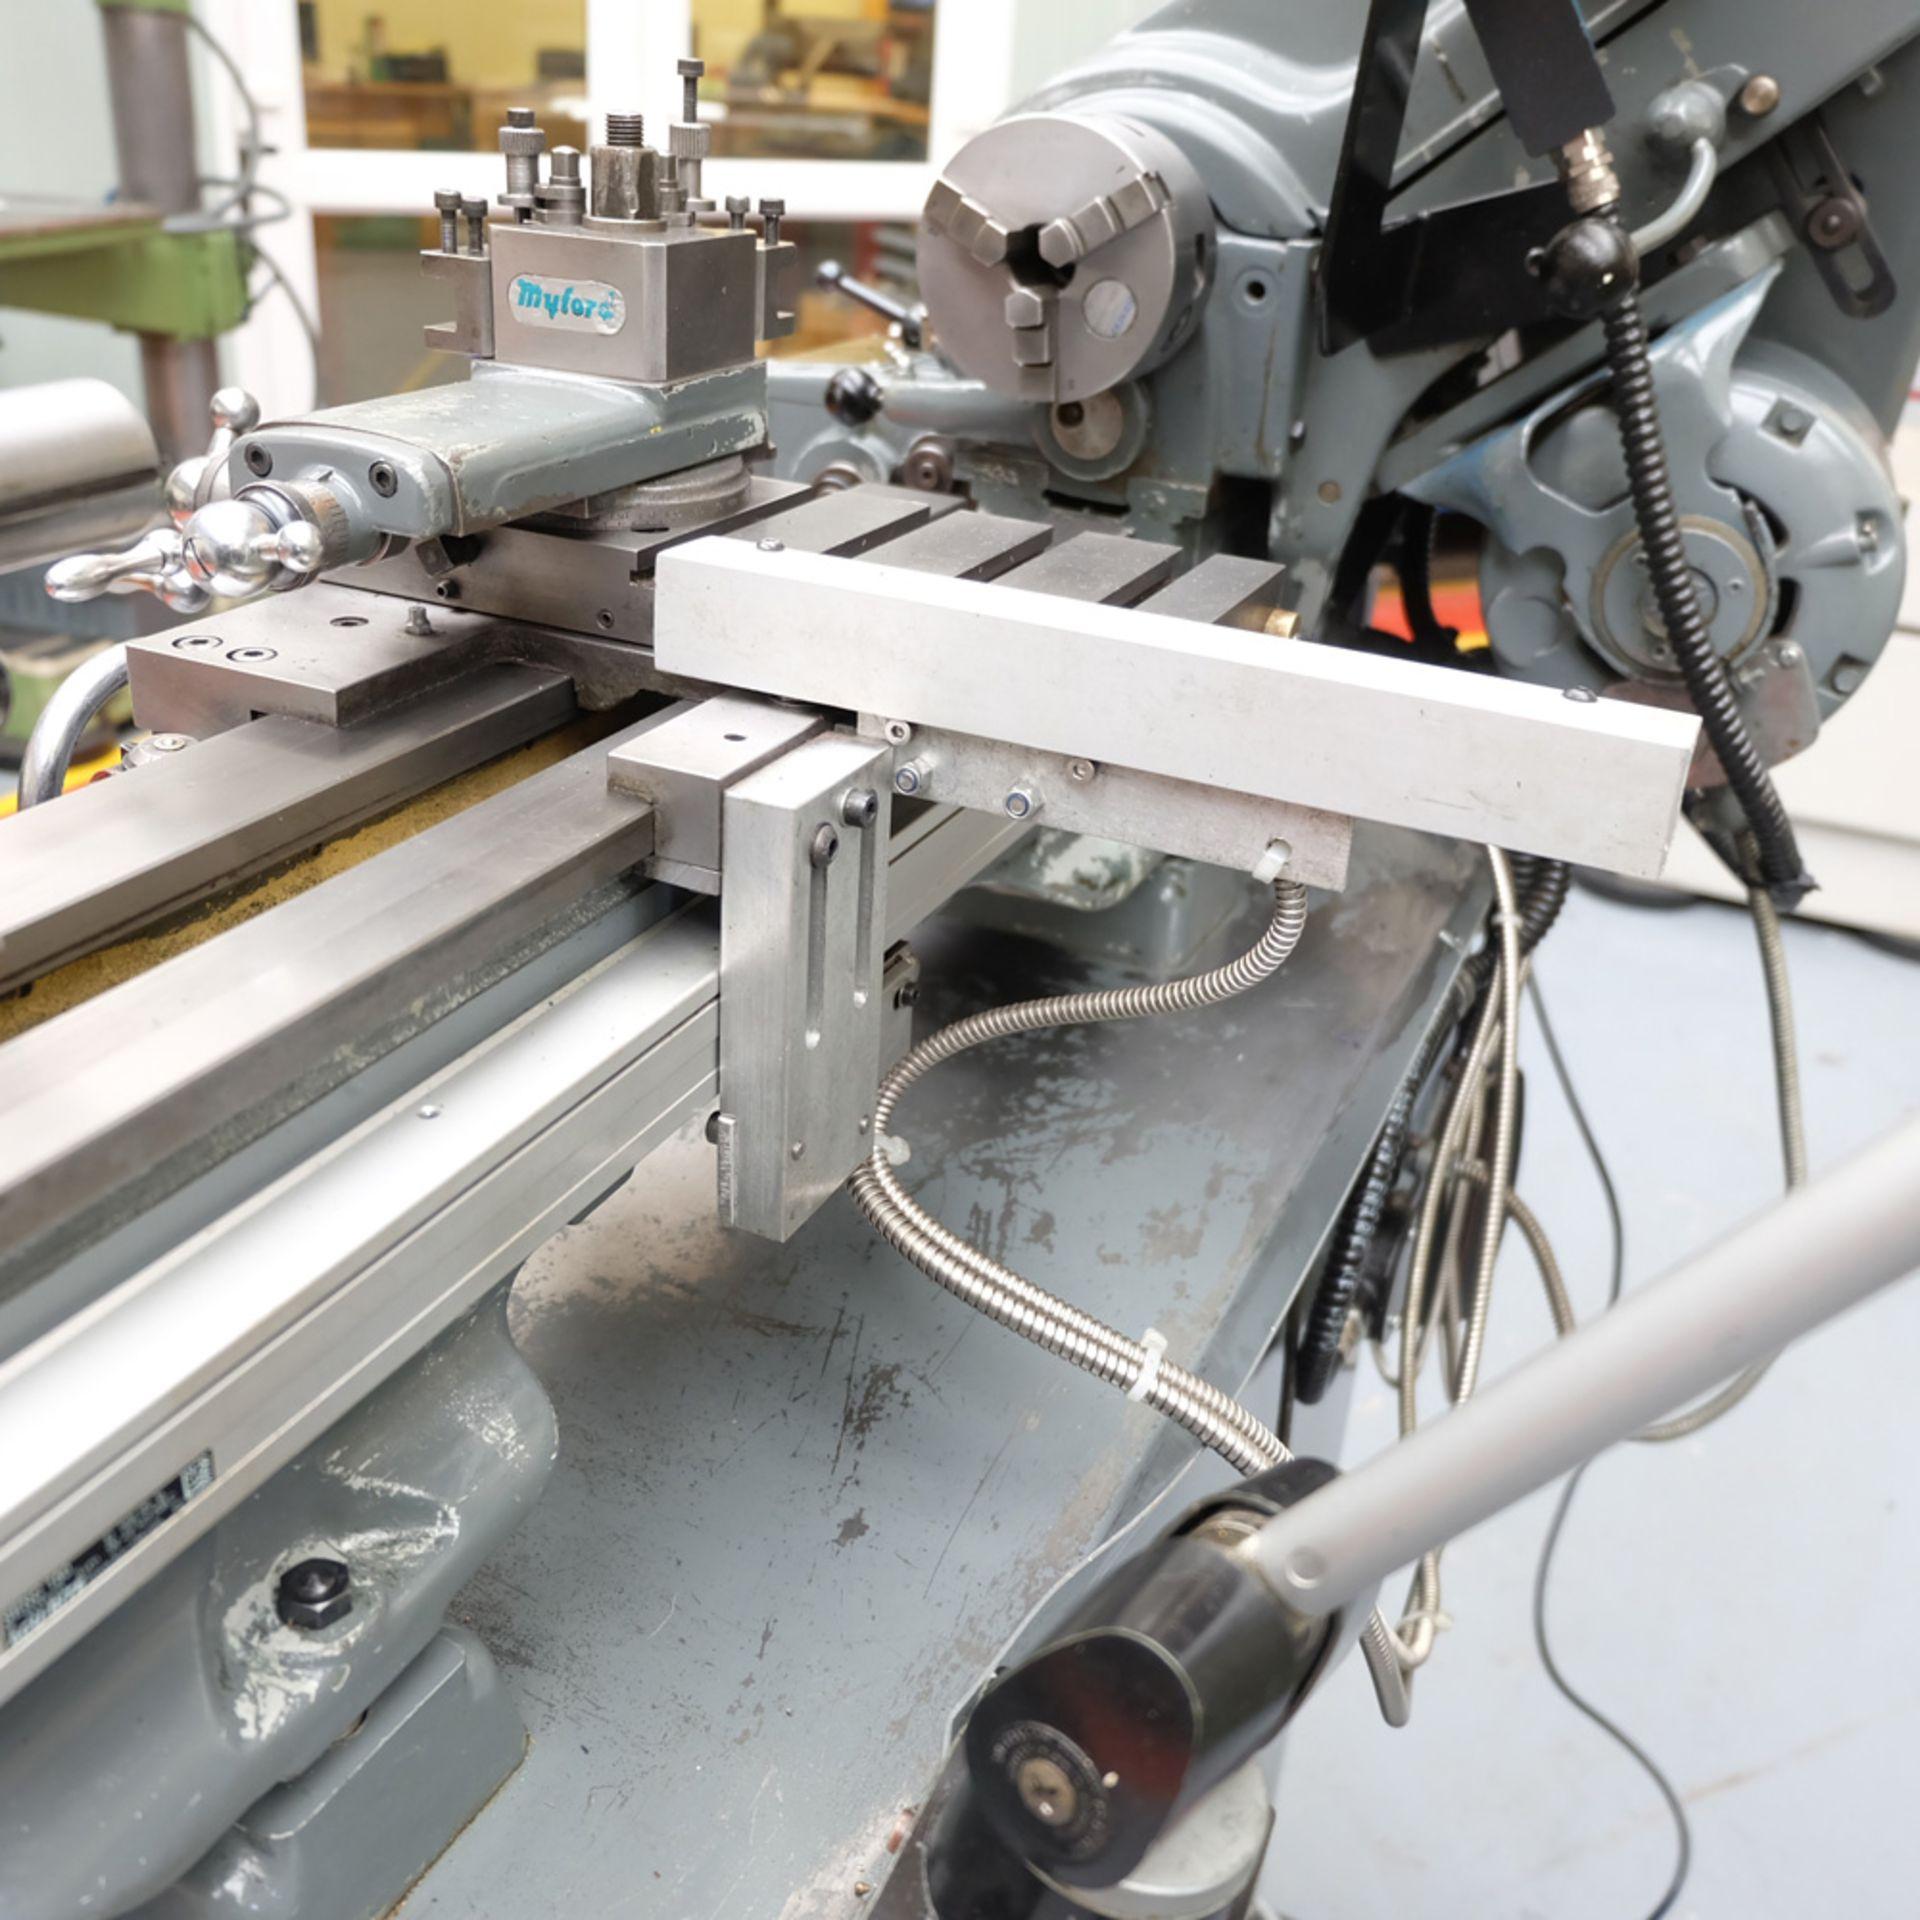 Myford Super 7 Model Makers Centre Lathe. - Image 11 of 17